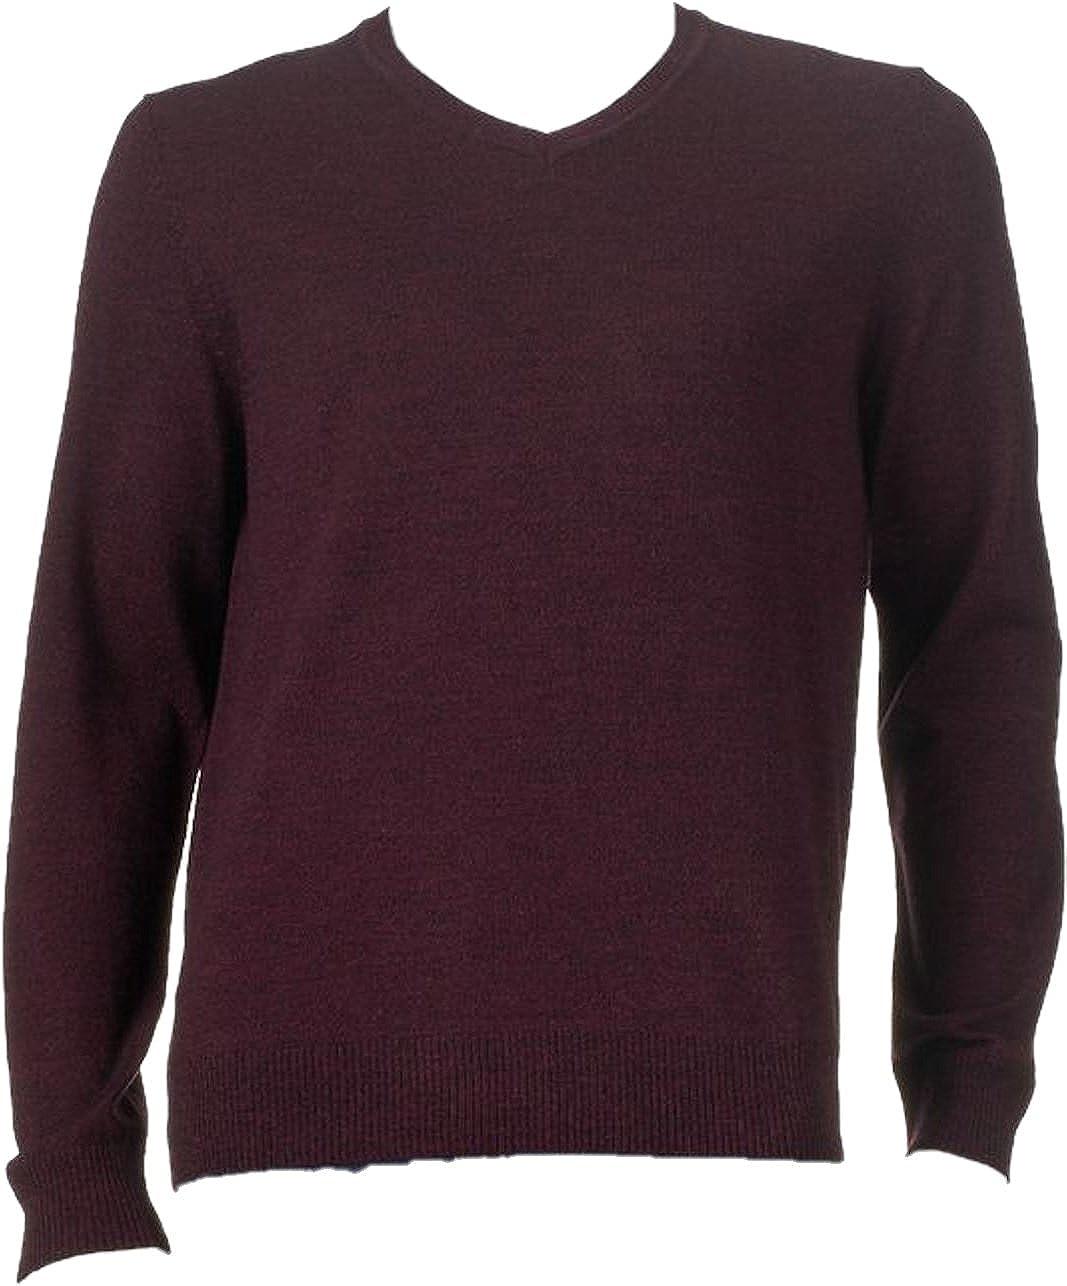 Apt 9 Mens Big /& Tall Modern Fit Merino V-Neck Sweater